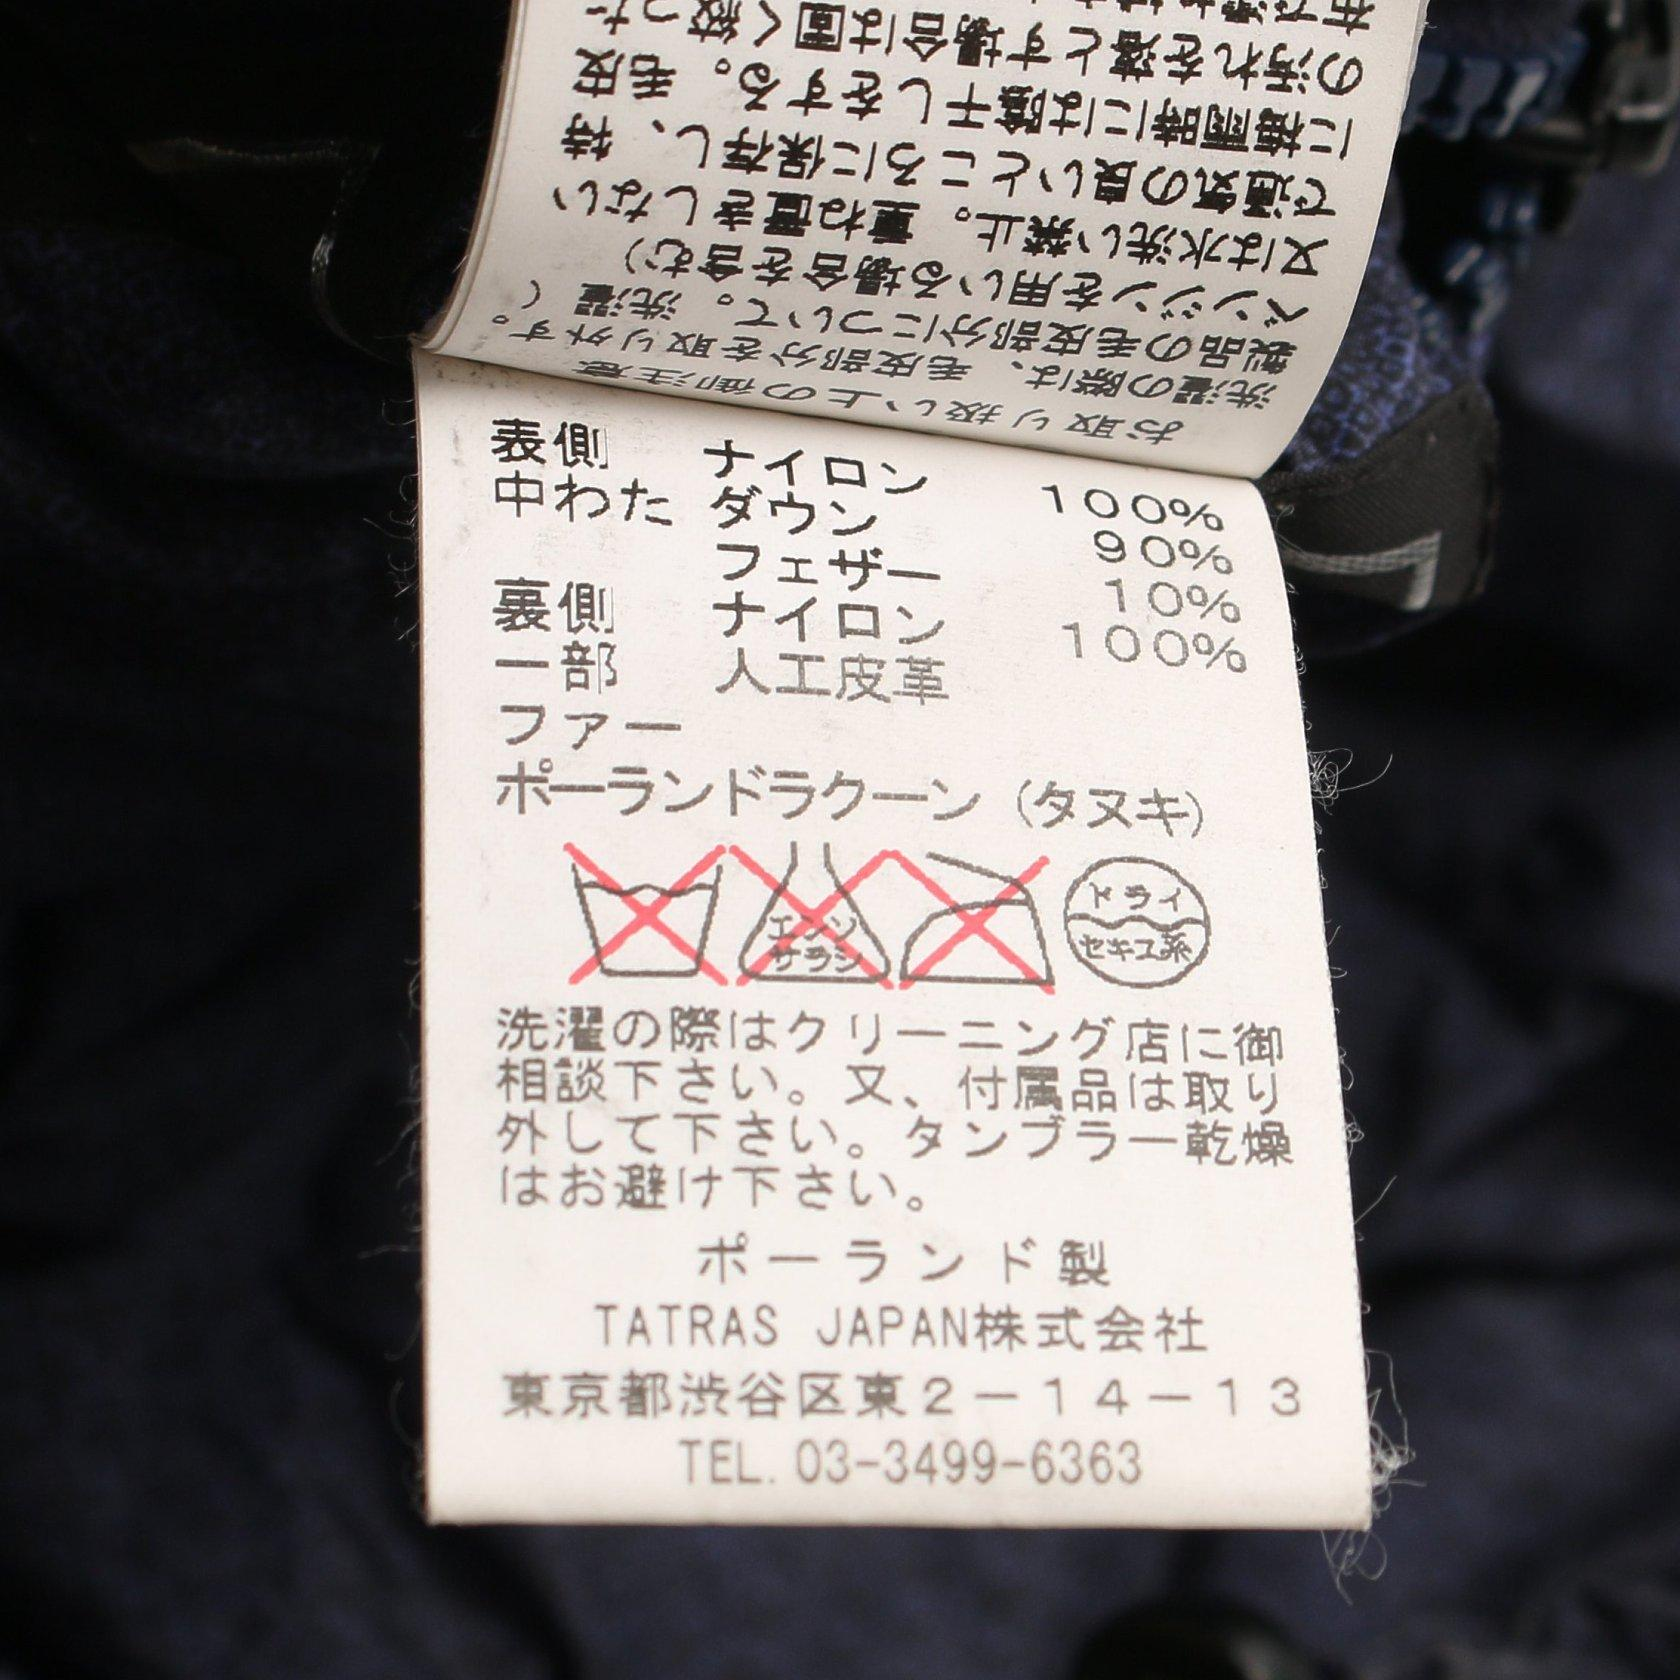 TATRAS・アウター・CLELIA クレリア ダウンコート ラクーン ダークパープル ネイビー リバーシブル